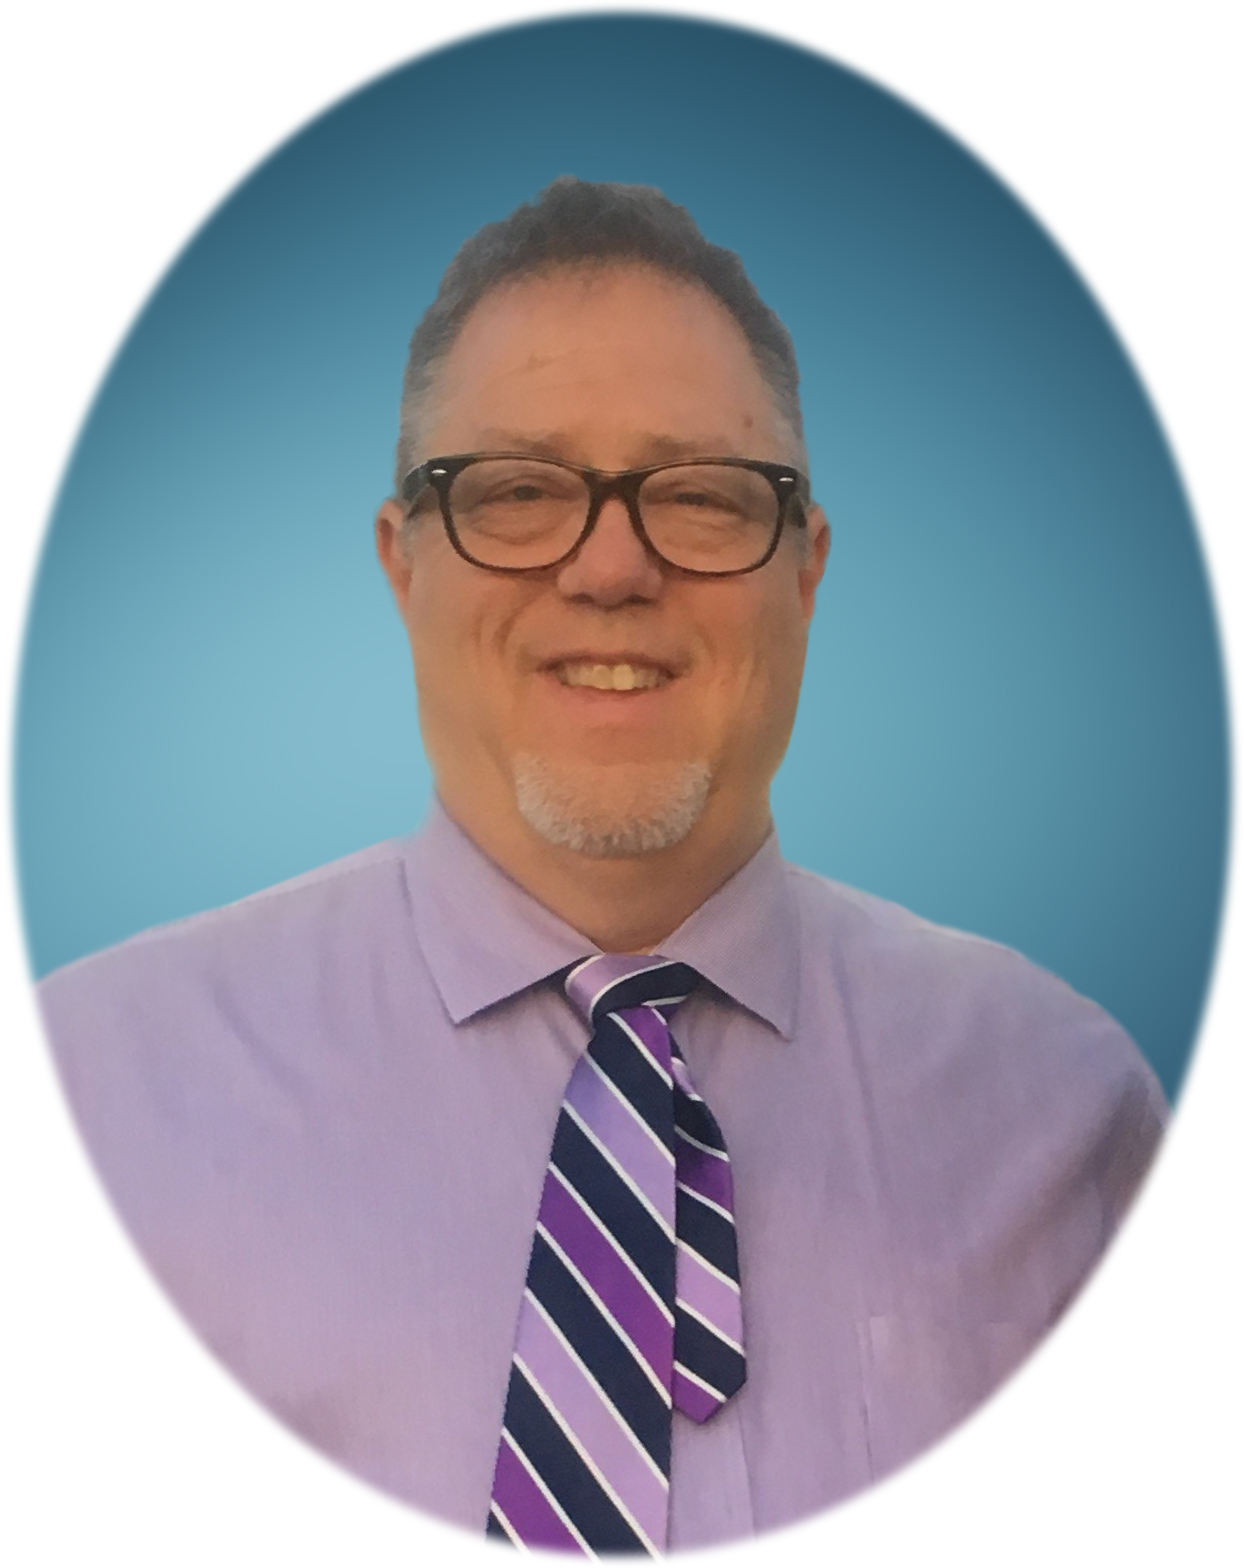 Scott J. Simpson